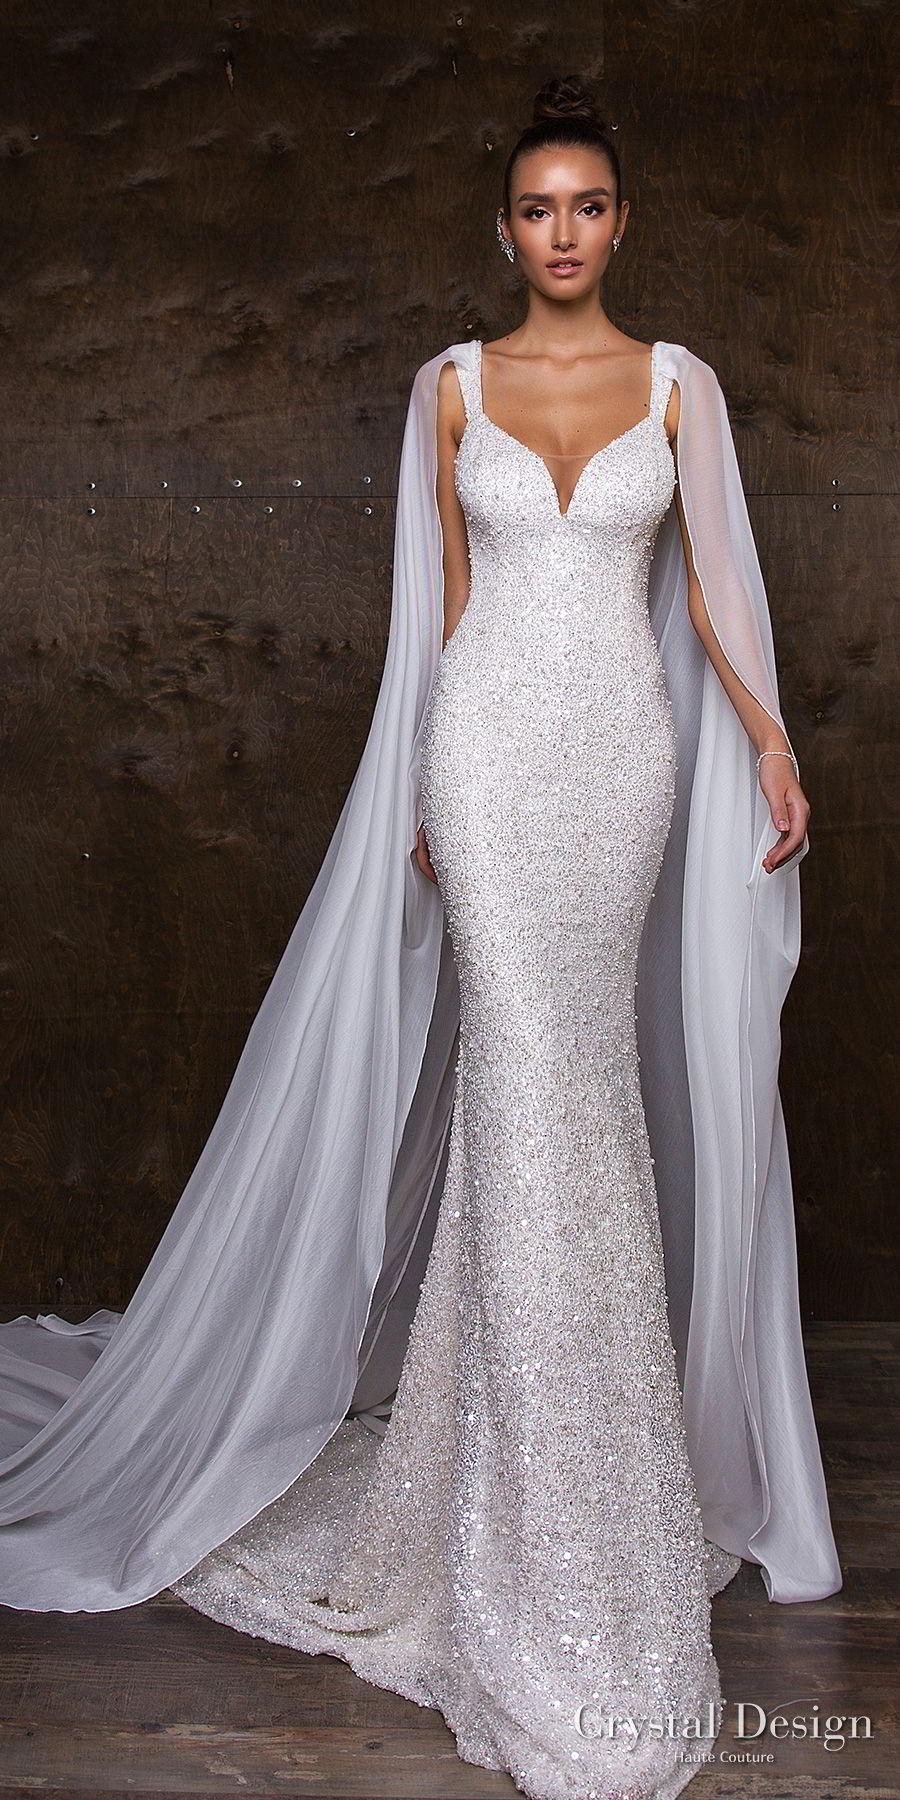 crystal design 2018 sleeveless with strap full embellishment glitter glamorous fit and flare wedding dress sweep train (syuzet) mv